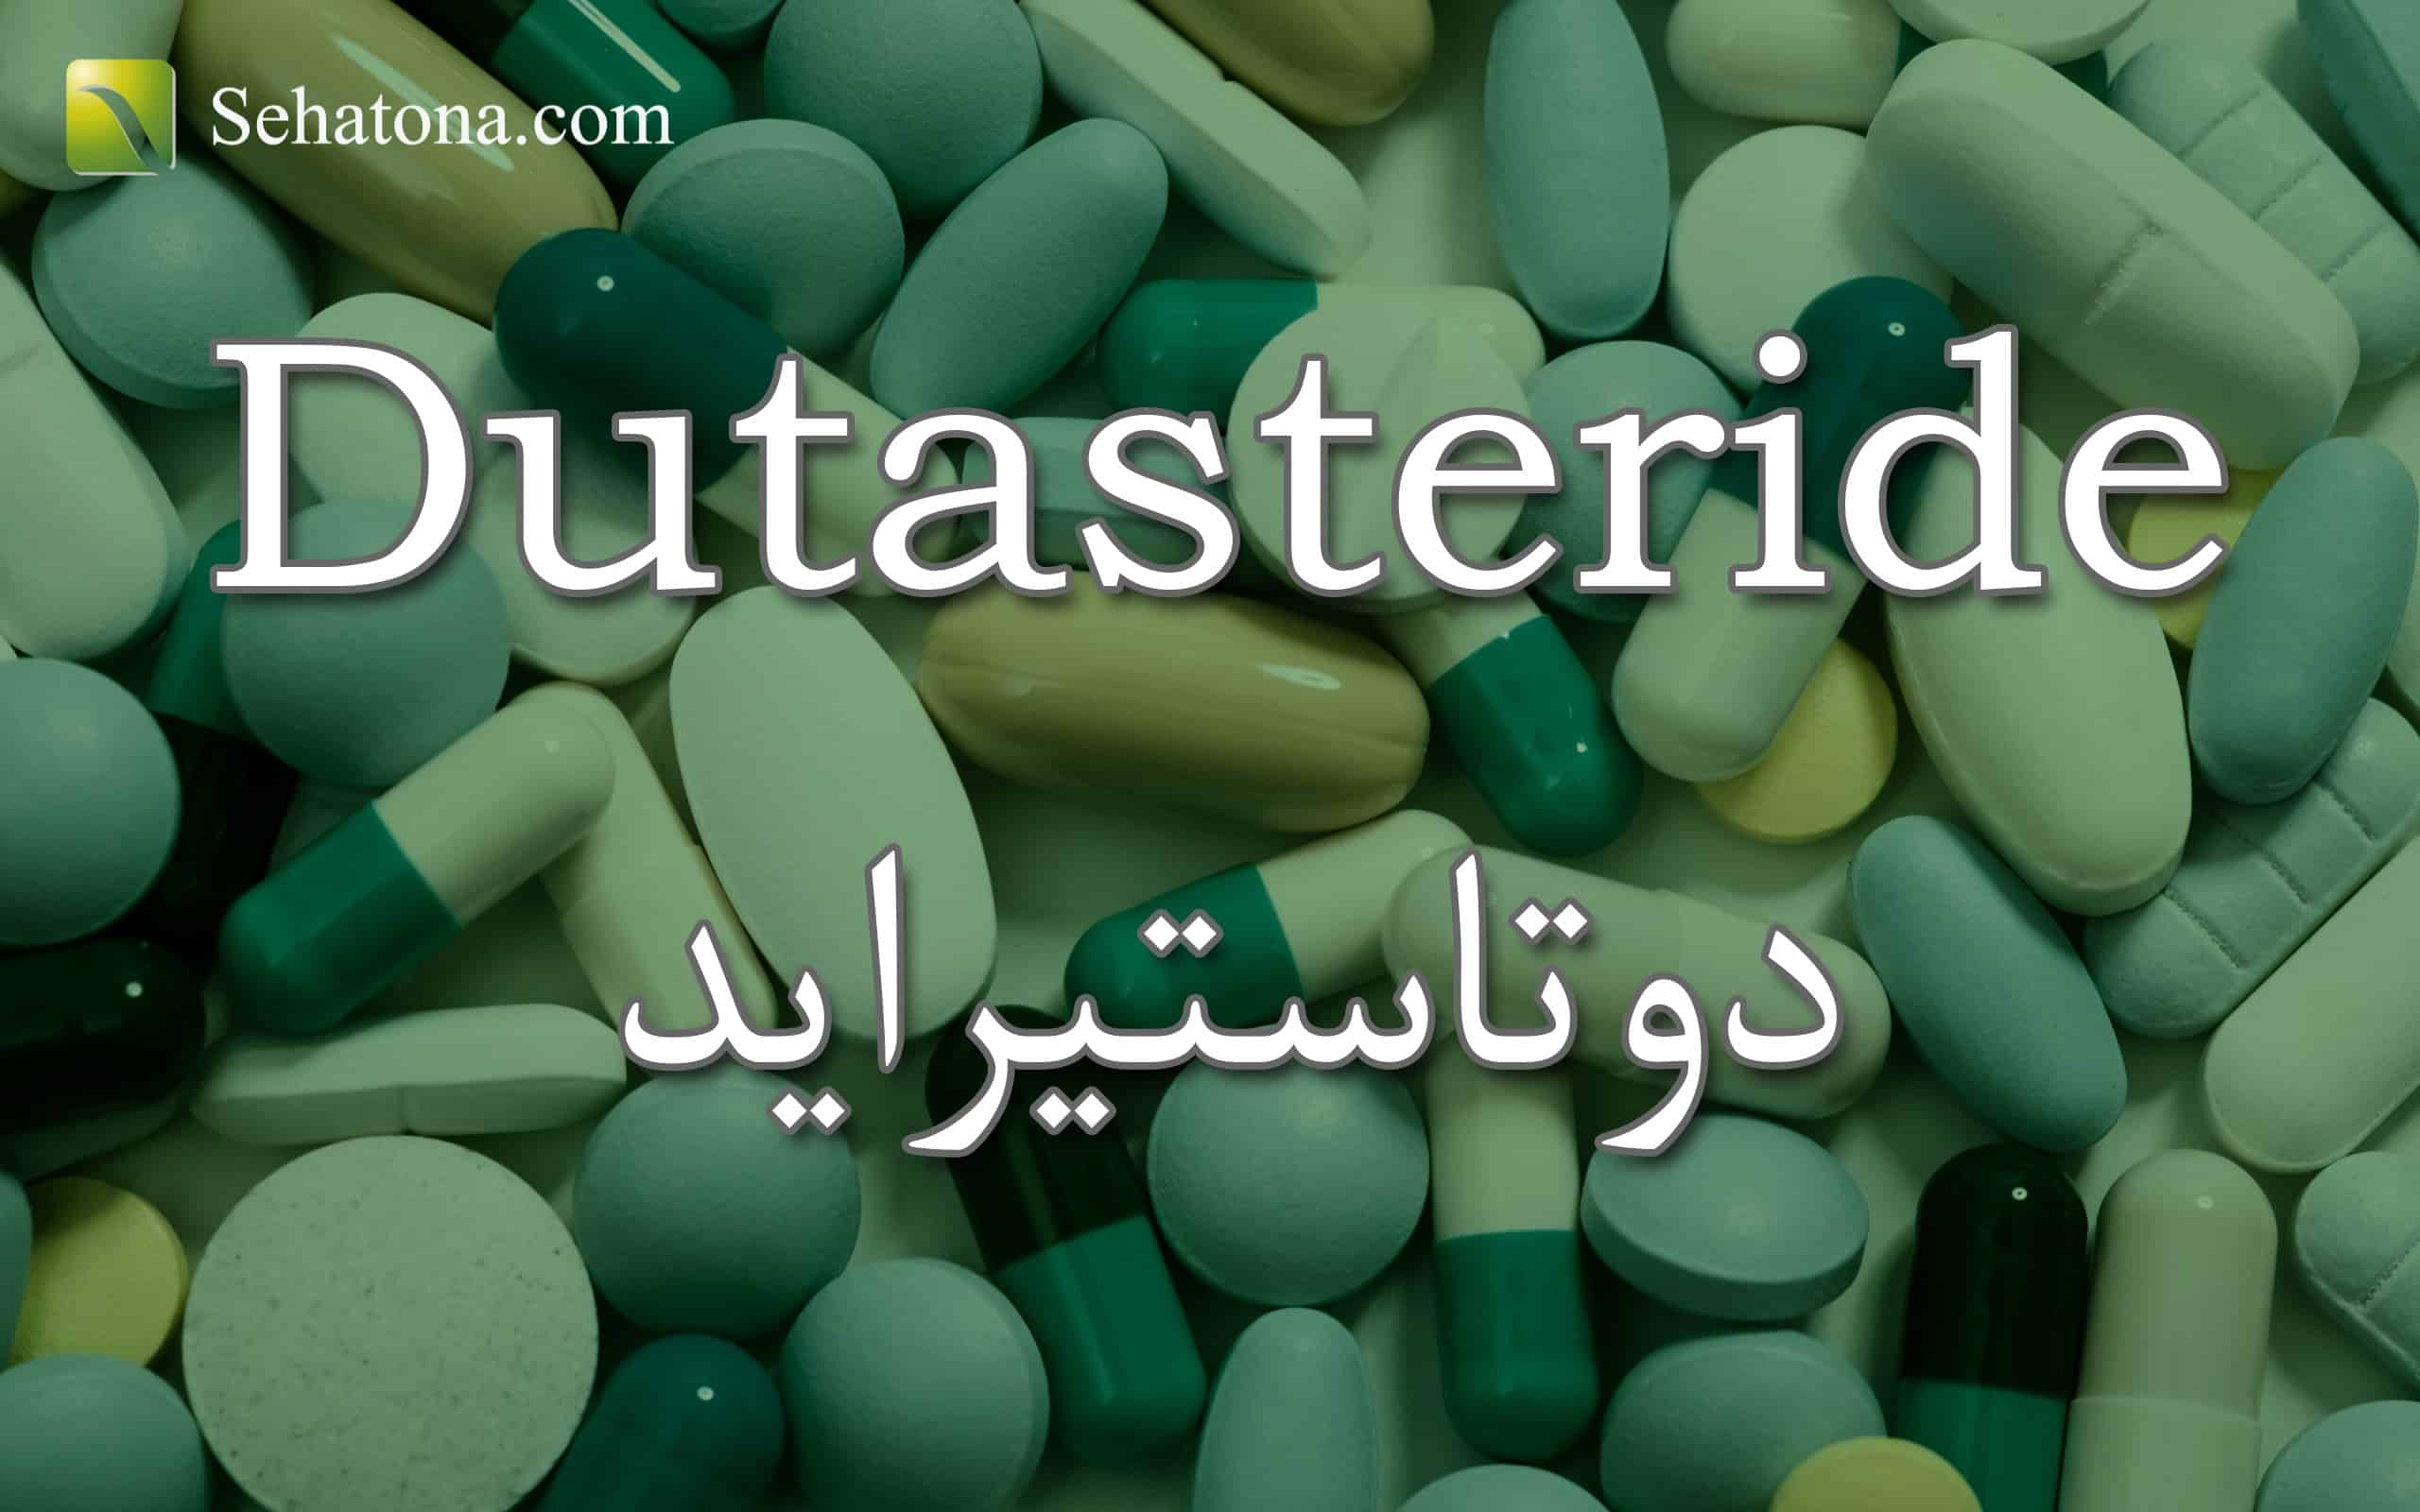 Dutasteride